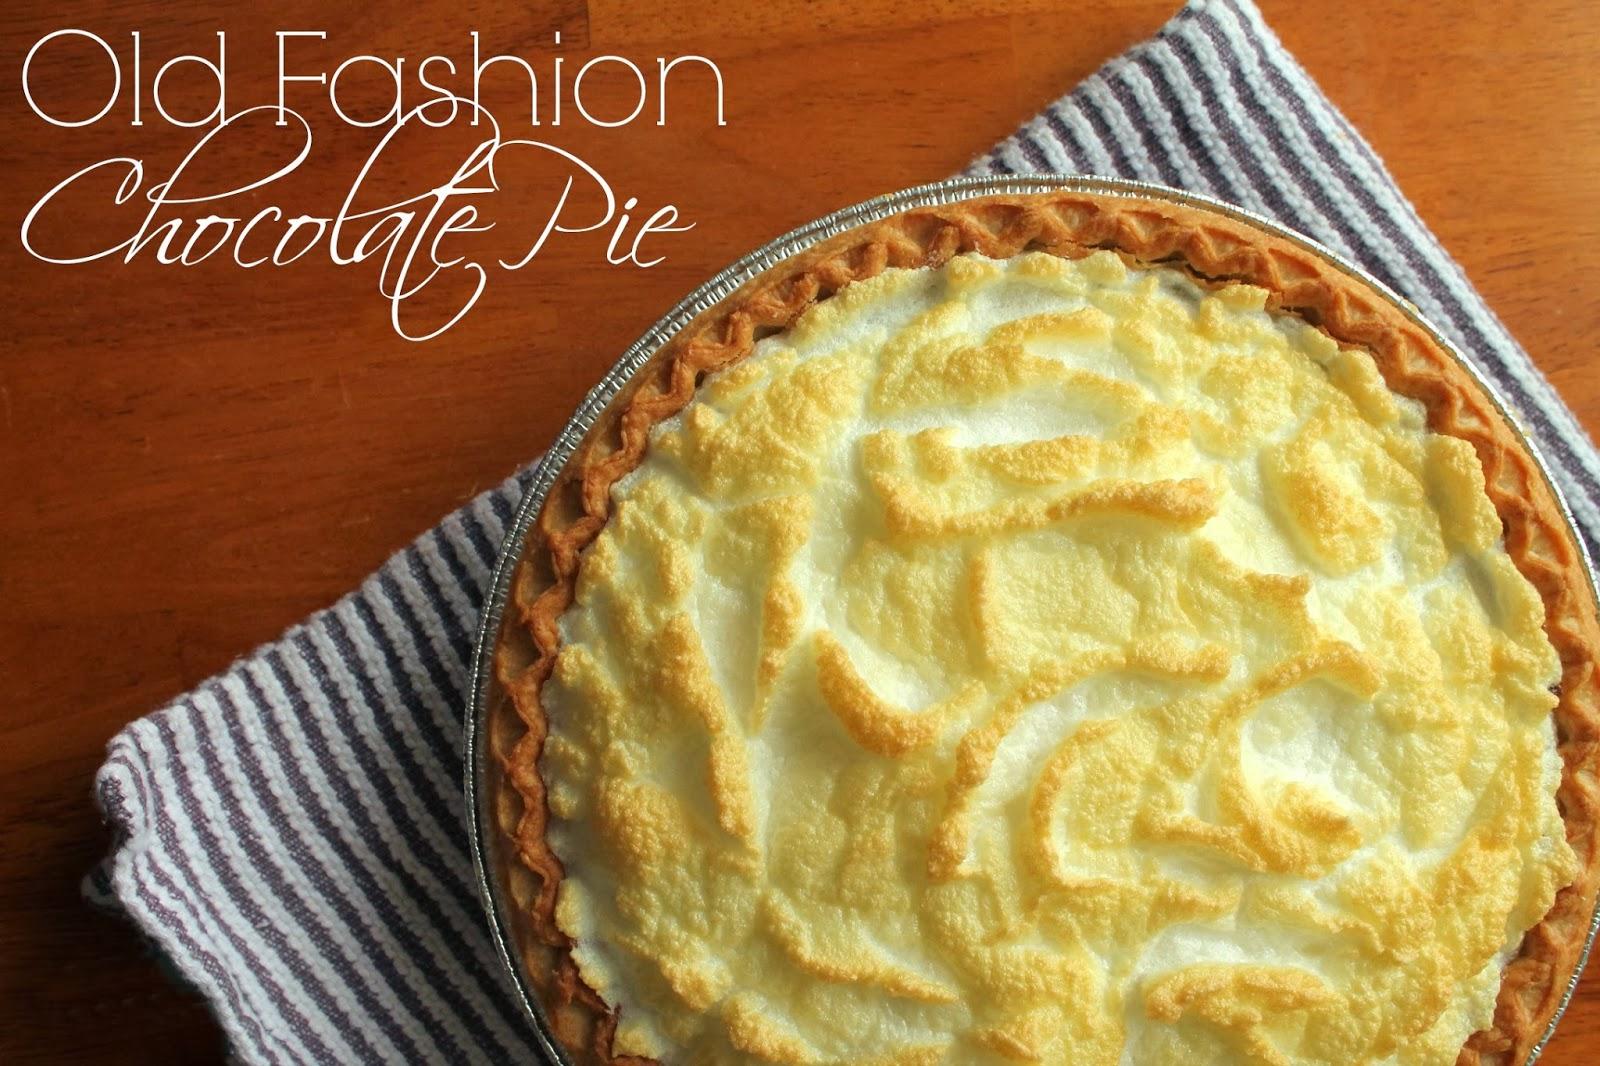 Old Fashion Chocolate Pie | My Grandmother's Recipes Louisiana Bride